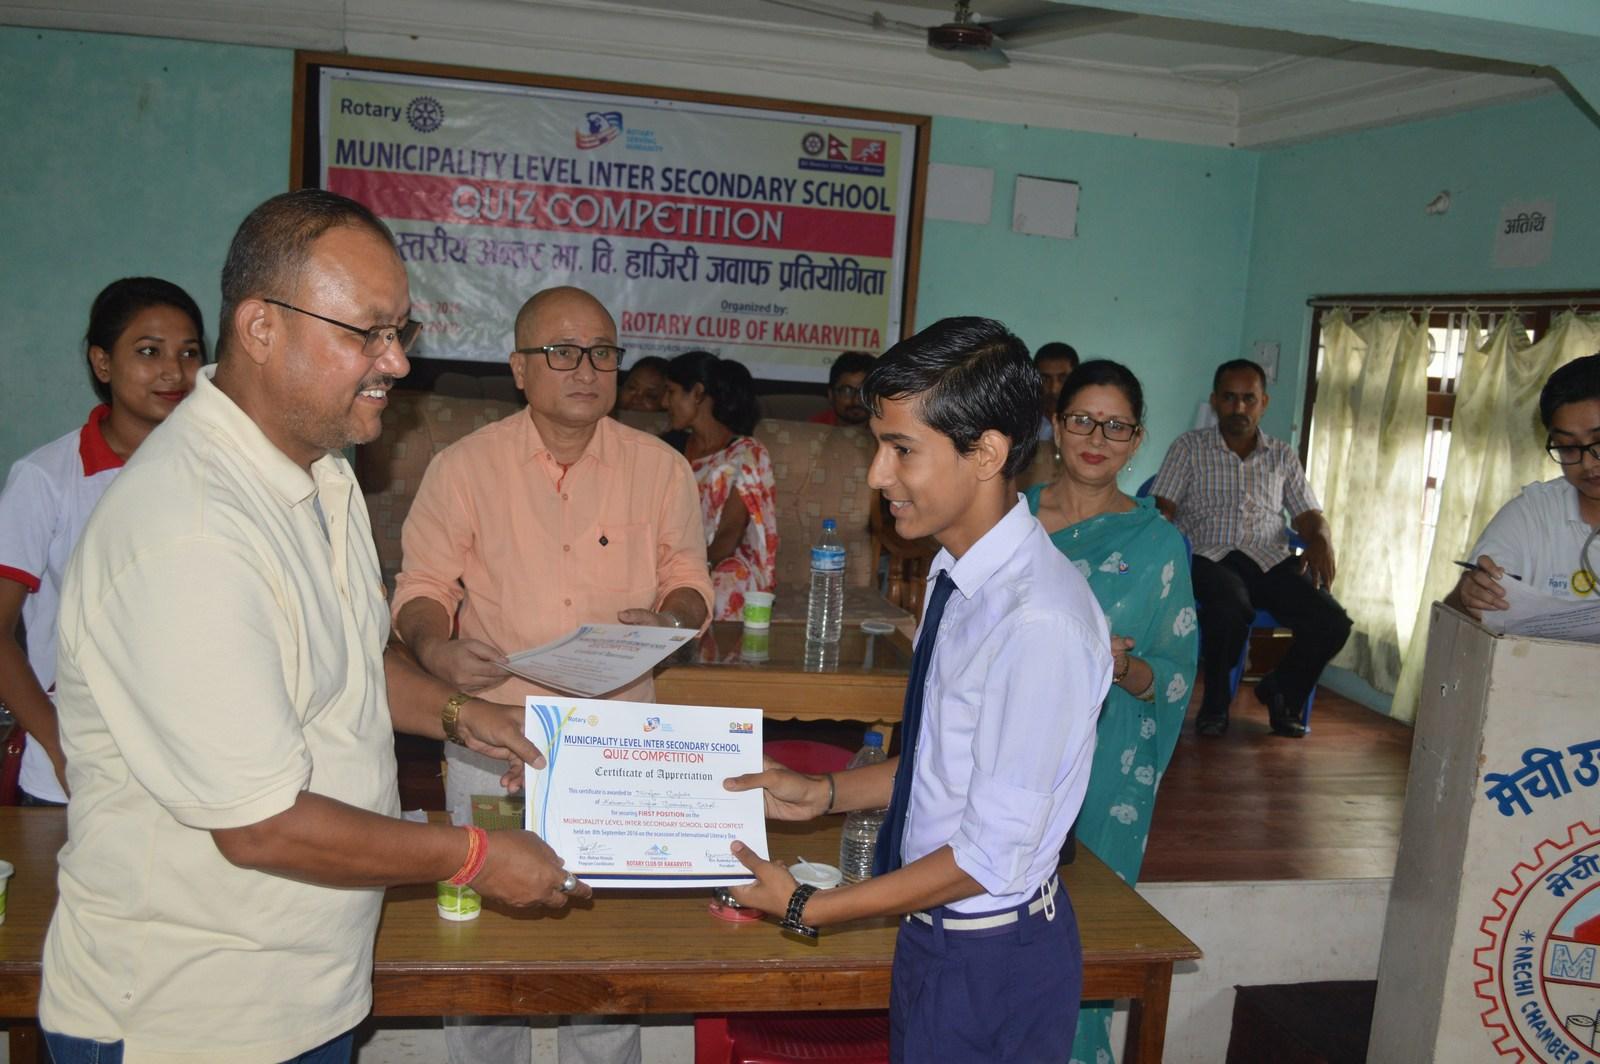 Municipality-Level-Inter-Secondary-School-Quiz-Contest-2016-Rotary-Club-of-Kakarvitta-58